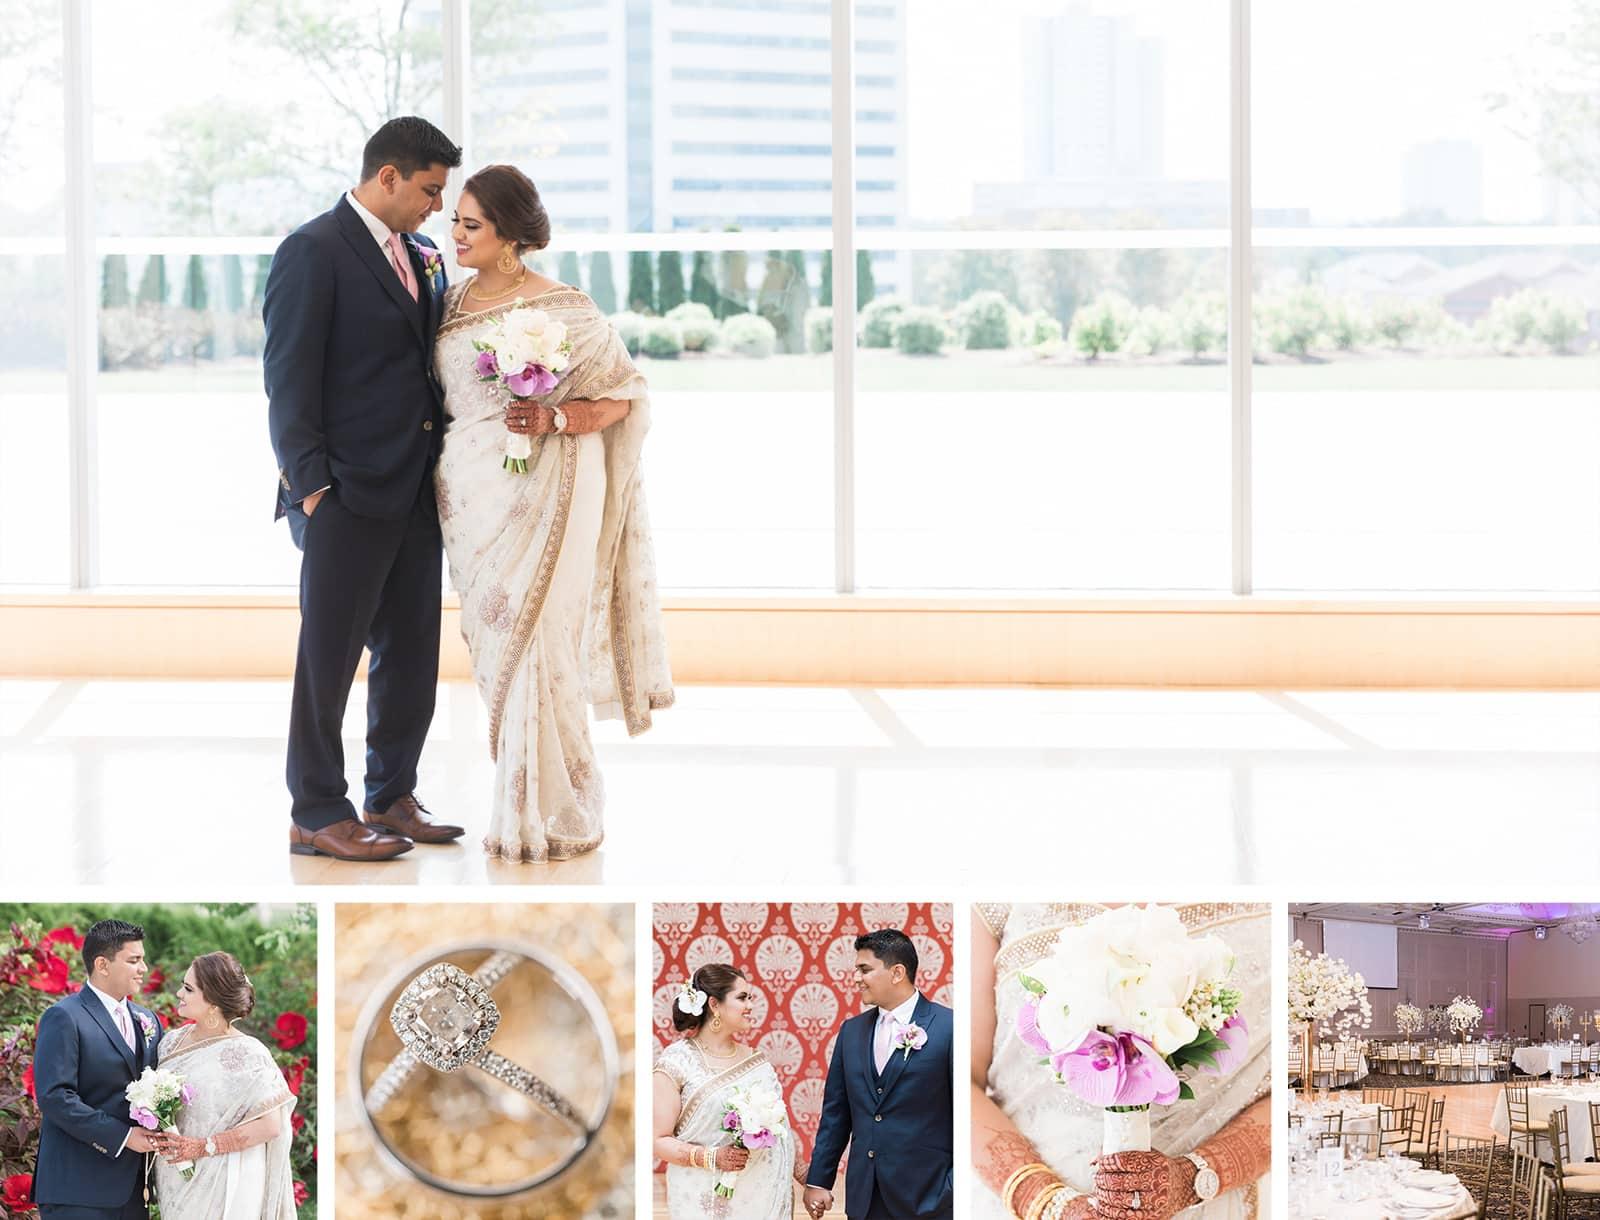 Toronto Ismaili Centre & Chateau Le Jardin Wedding: Anum + Hussain